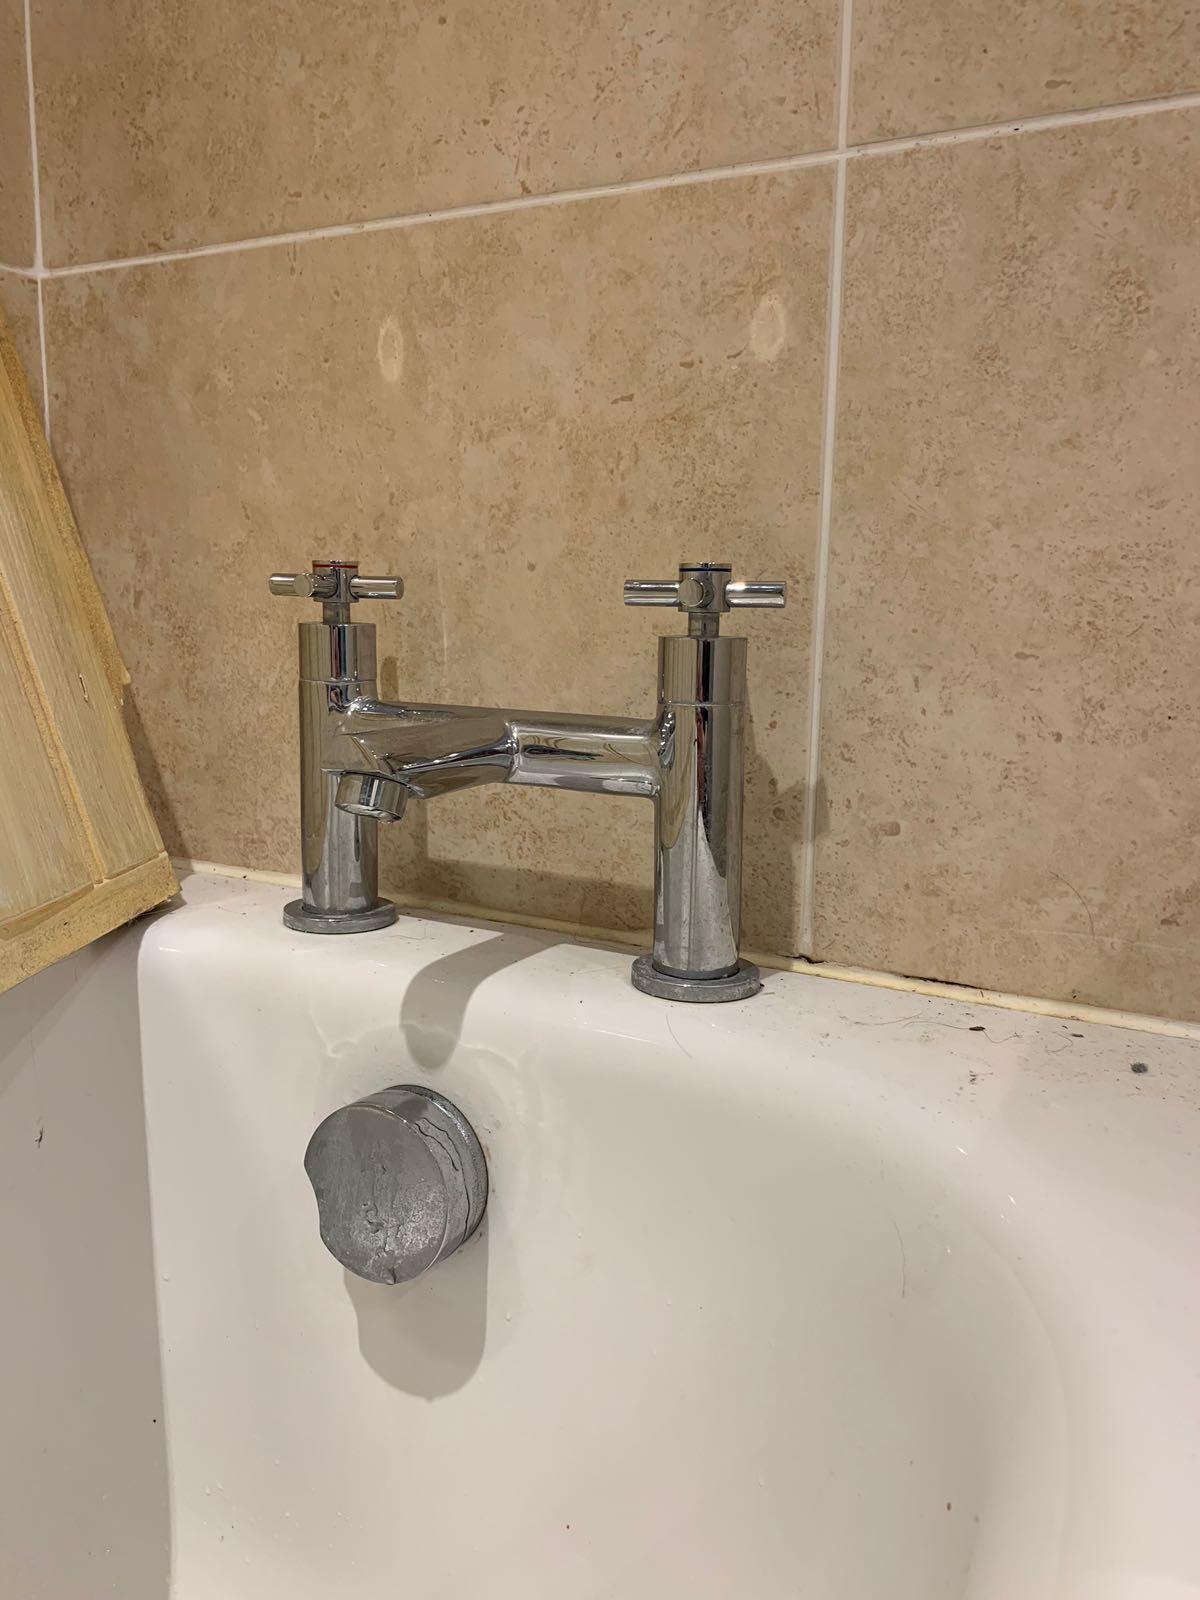 Heating-Plumbing-Gallery-135